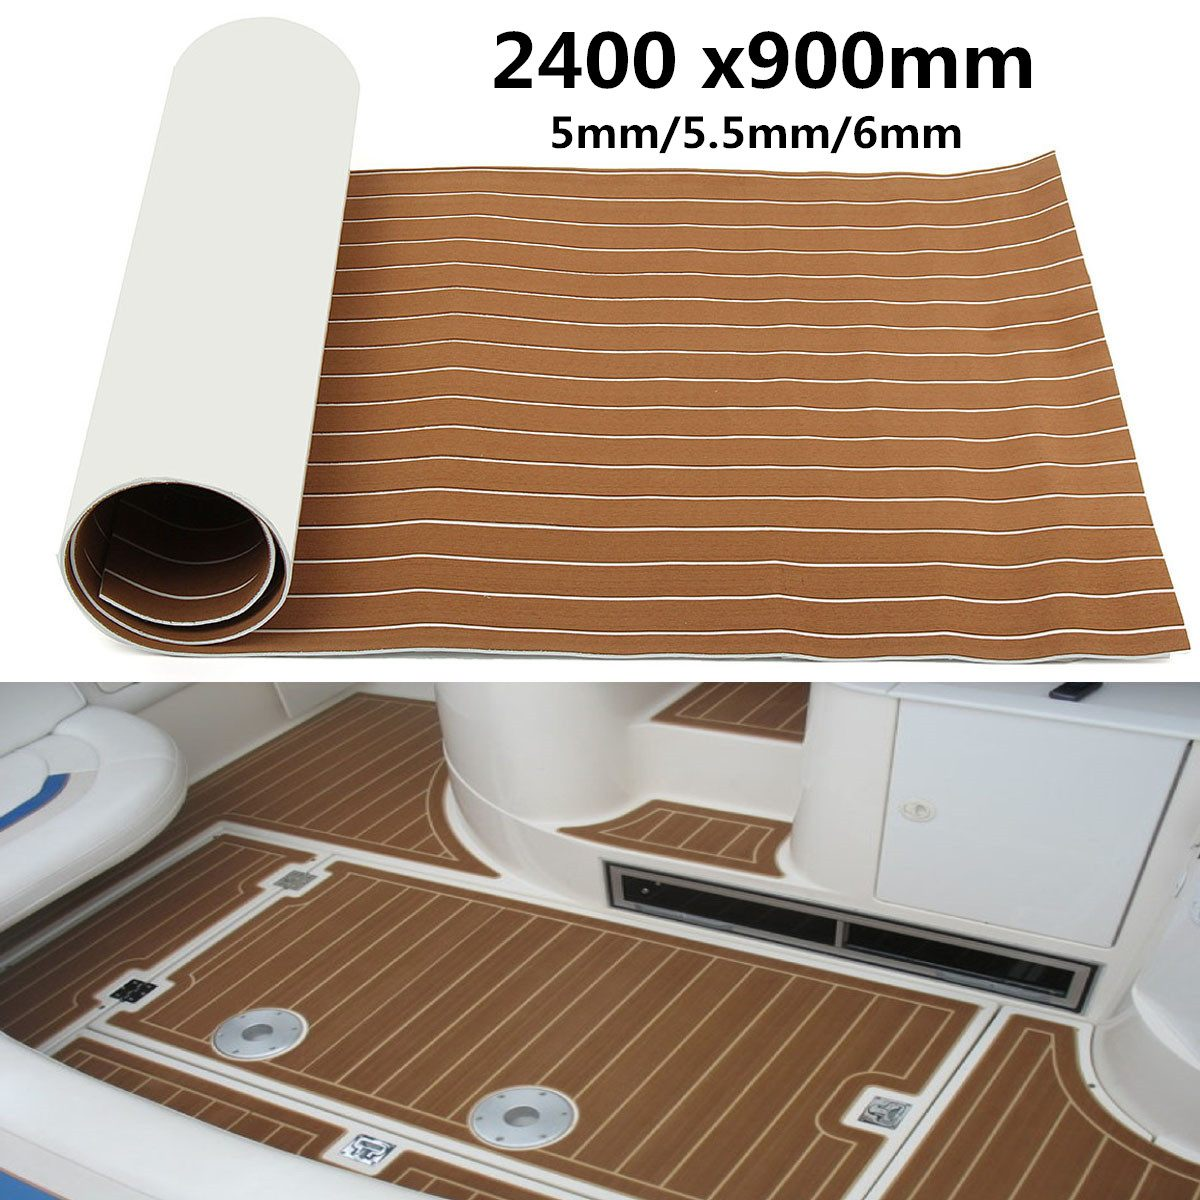 1Roll 2400x900x6mm Boat Marine Flooring Faux Teak EVA Foam Decking Sheet Decor Self Adhesive EVA Foam Floor Mat Cover Brown Gray